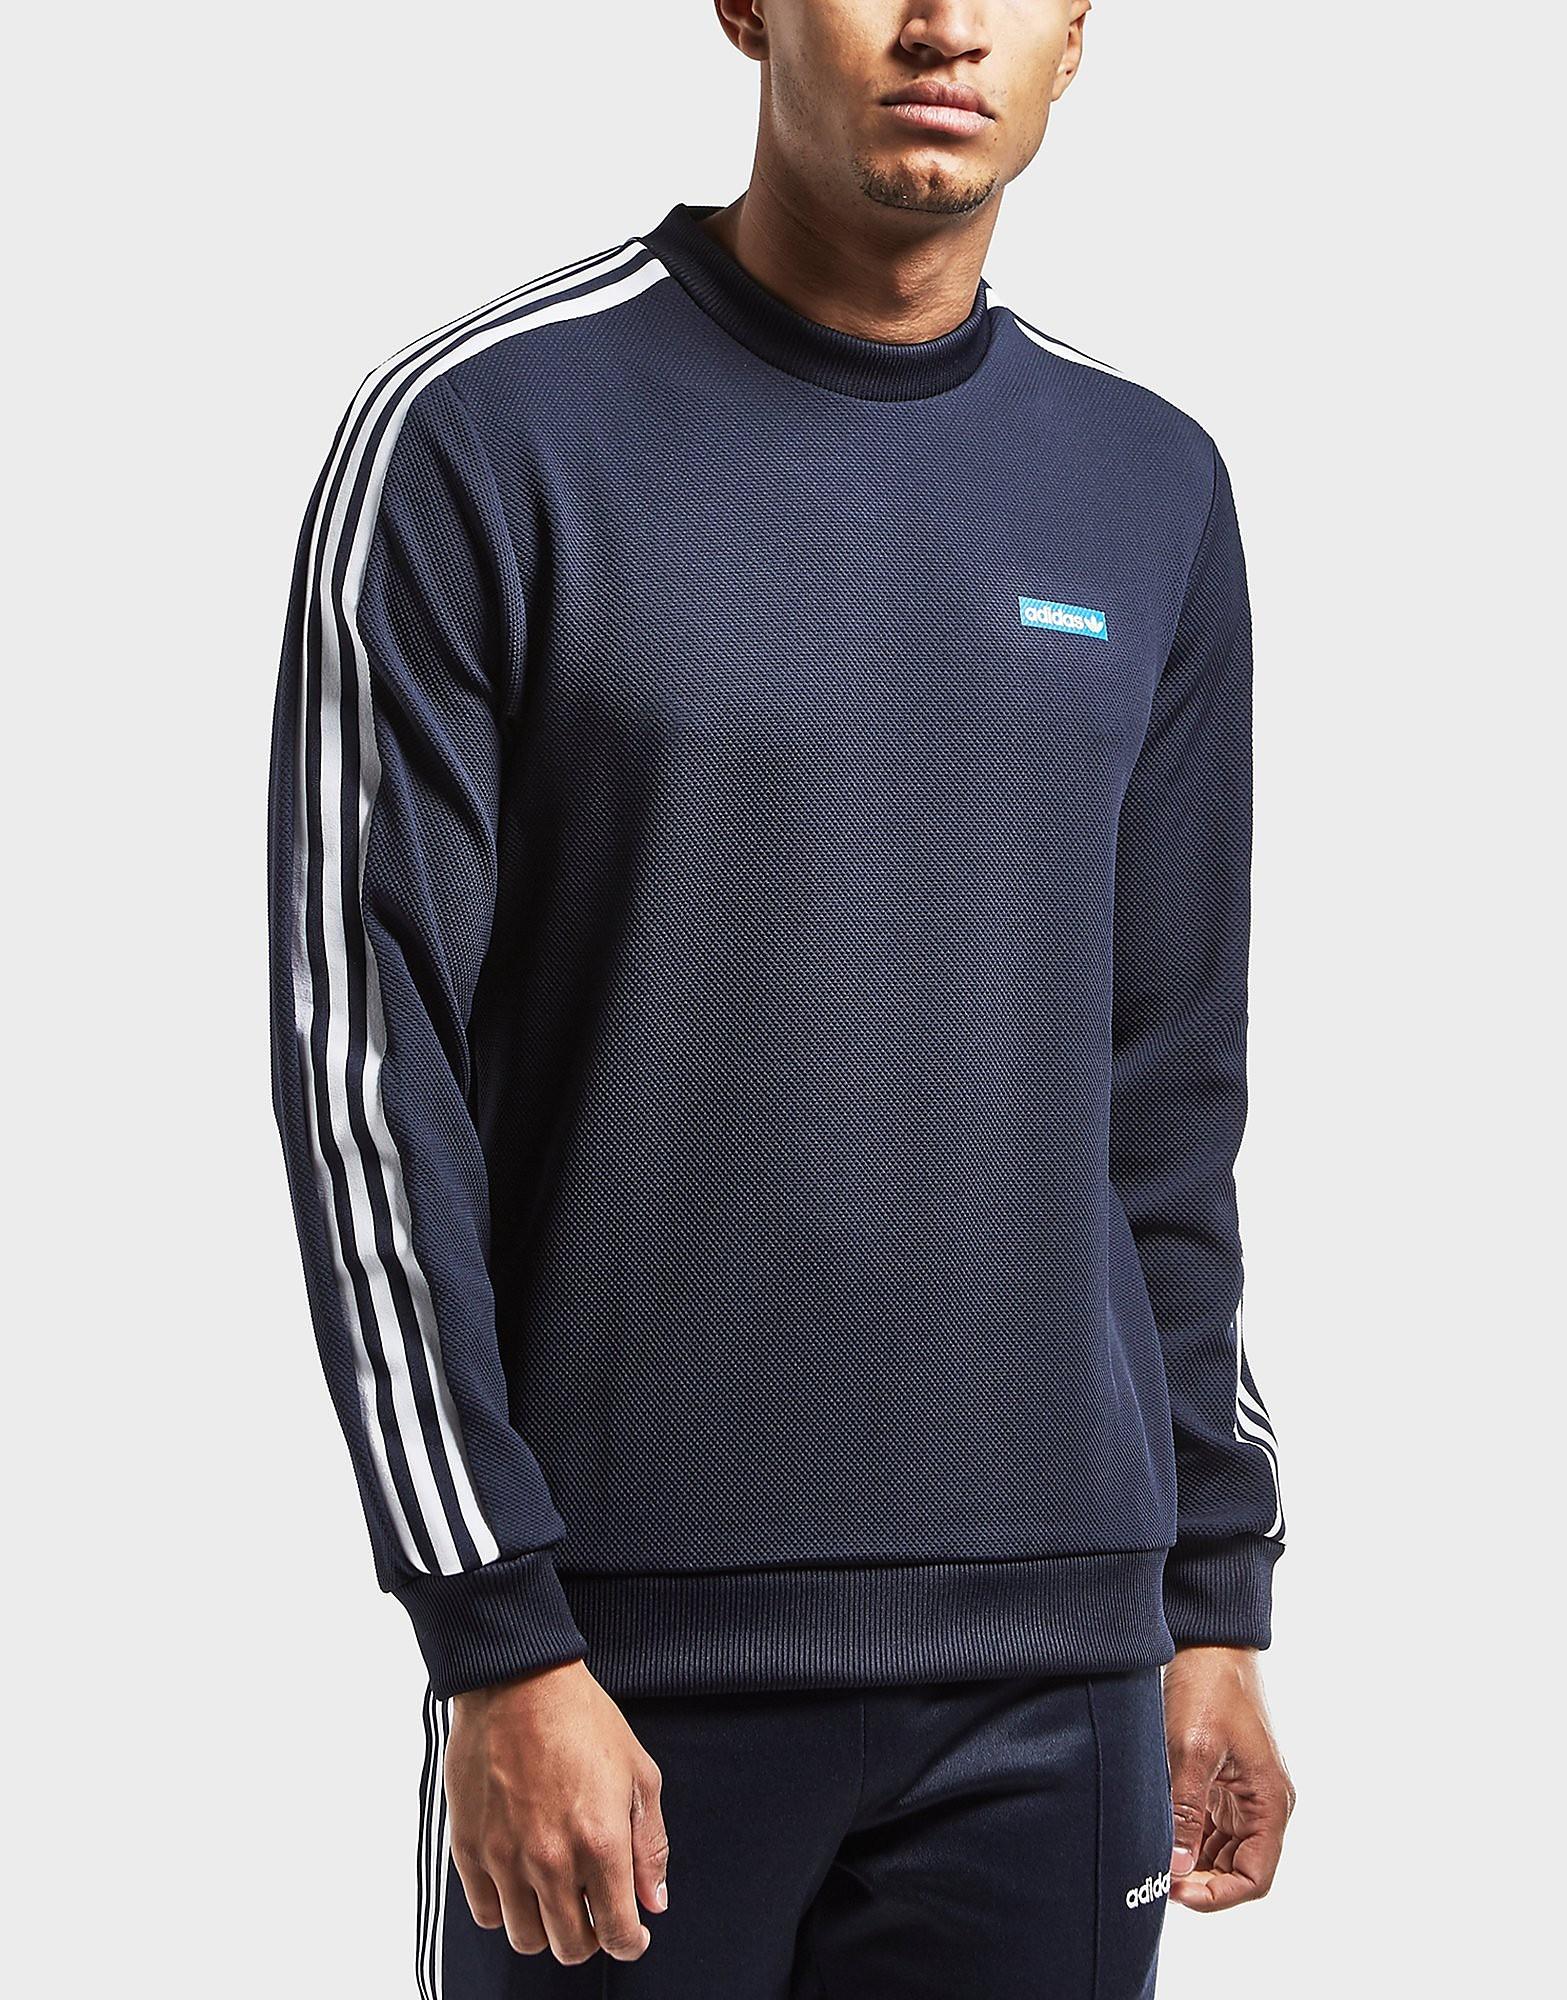 adidas Originals Tennoji Sweatshirt